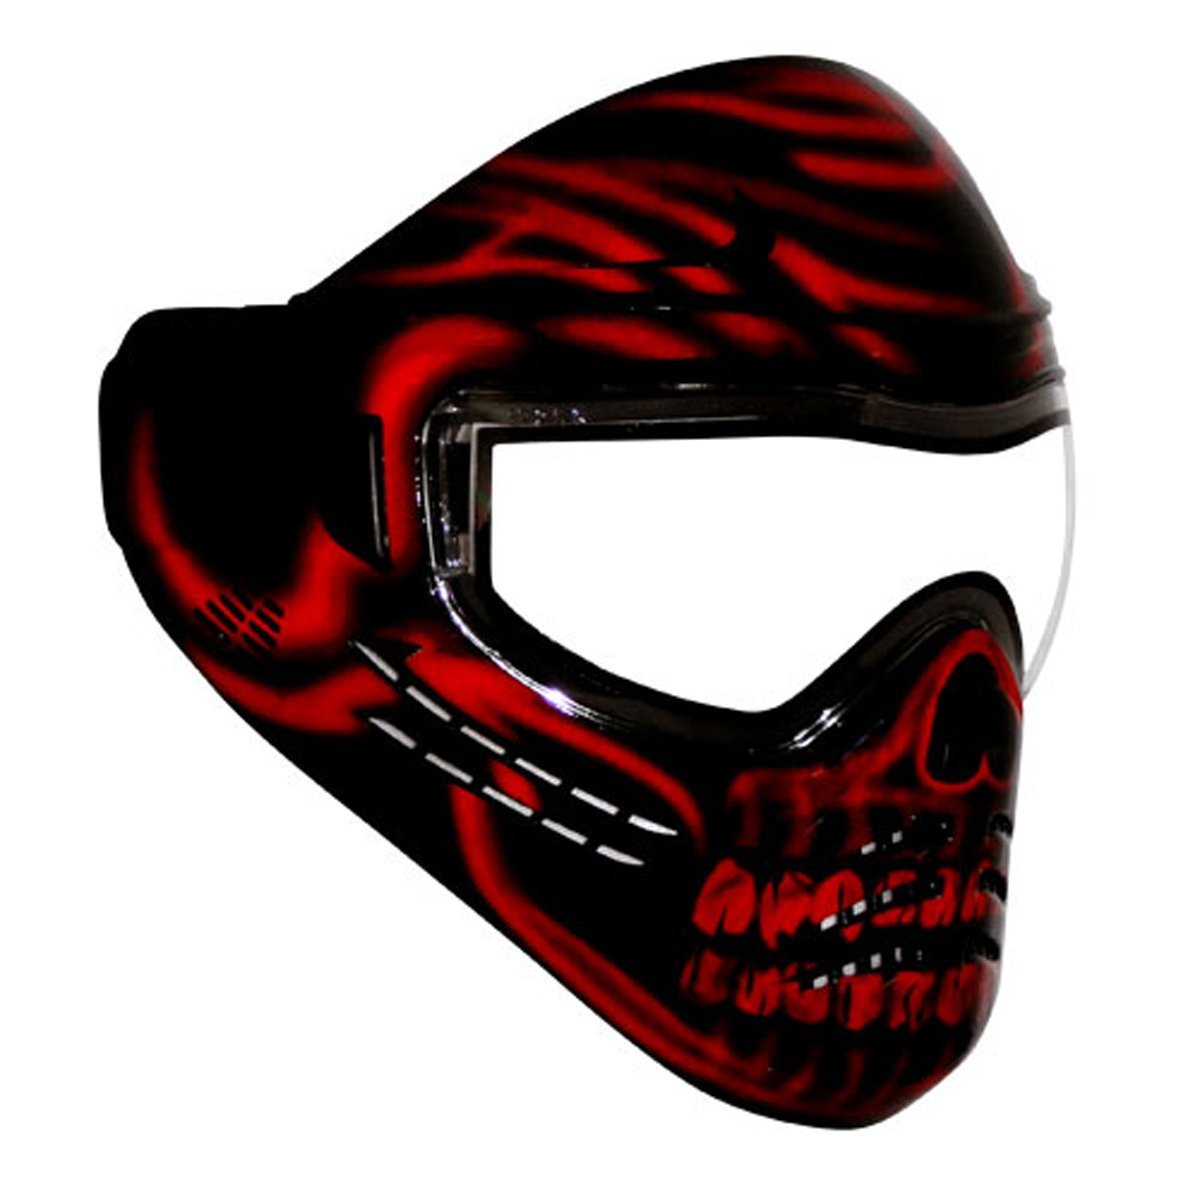 paintball mask - photo #3